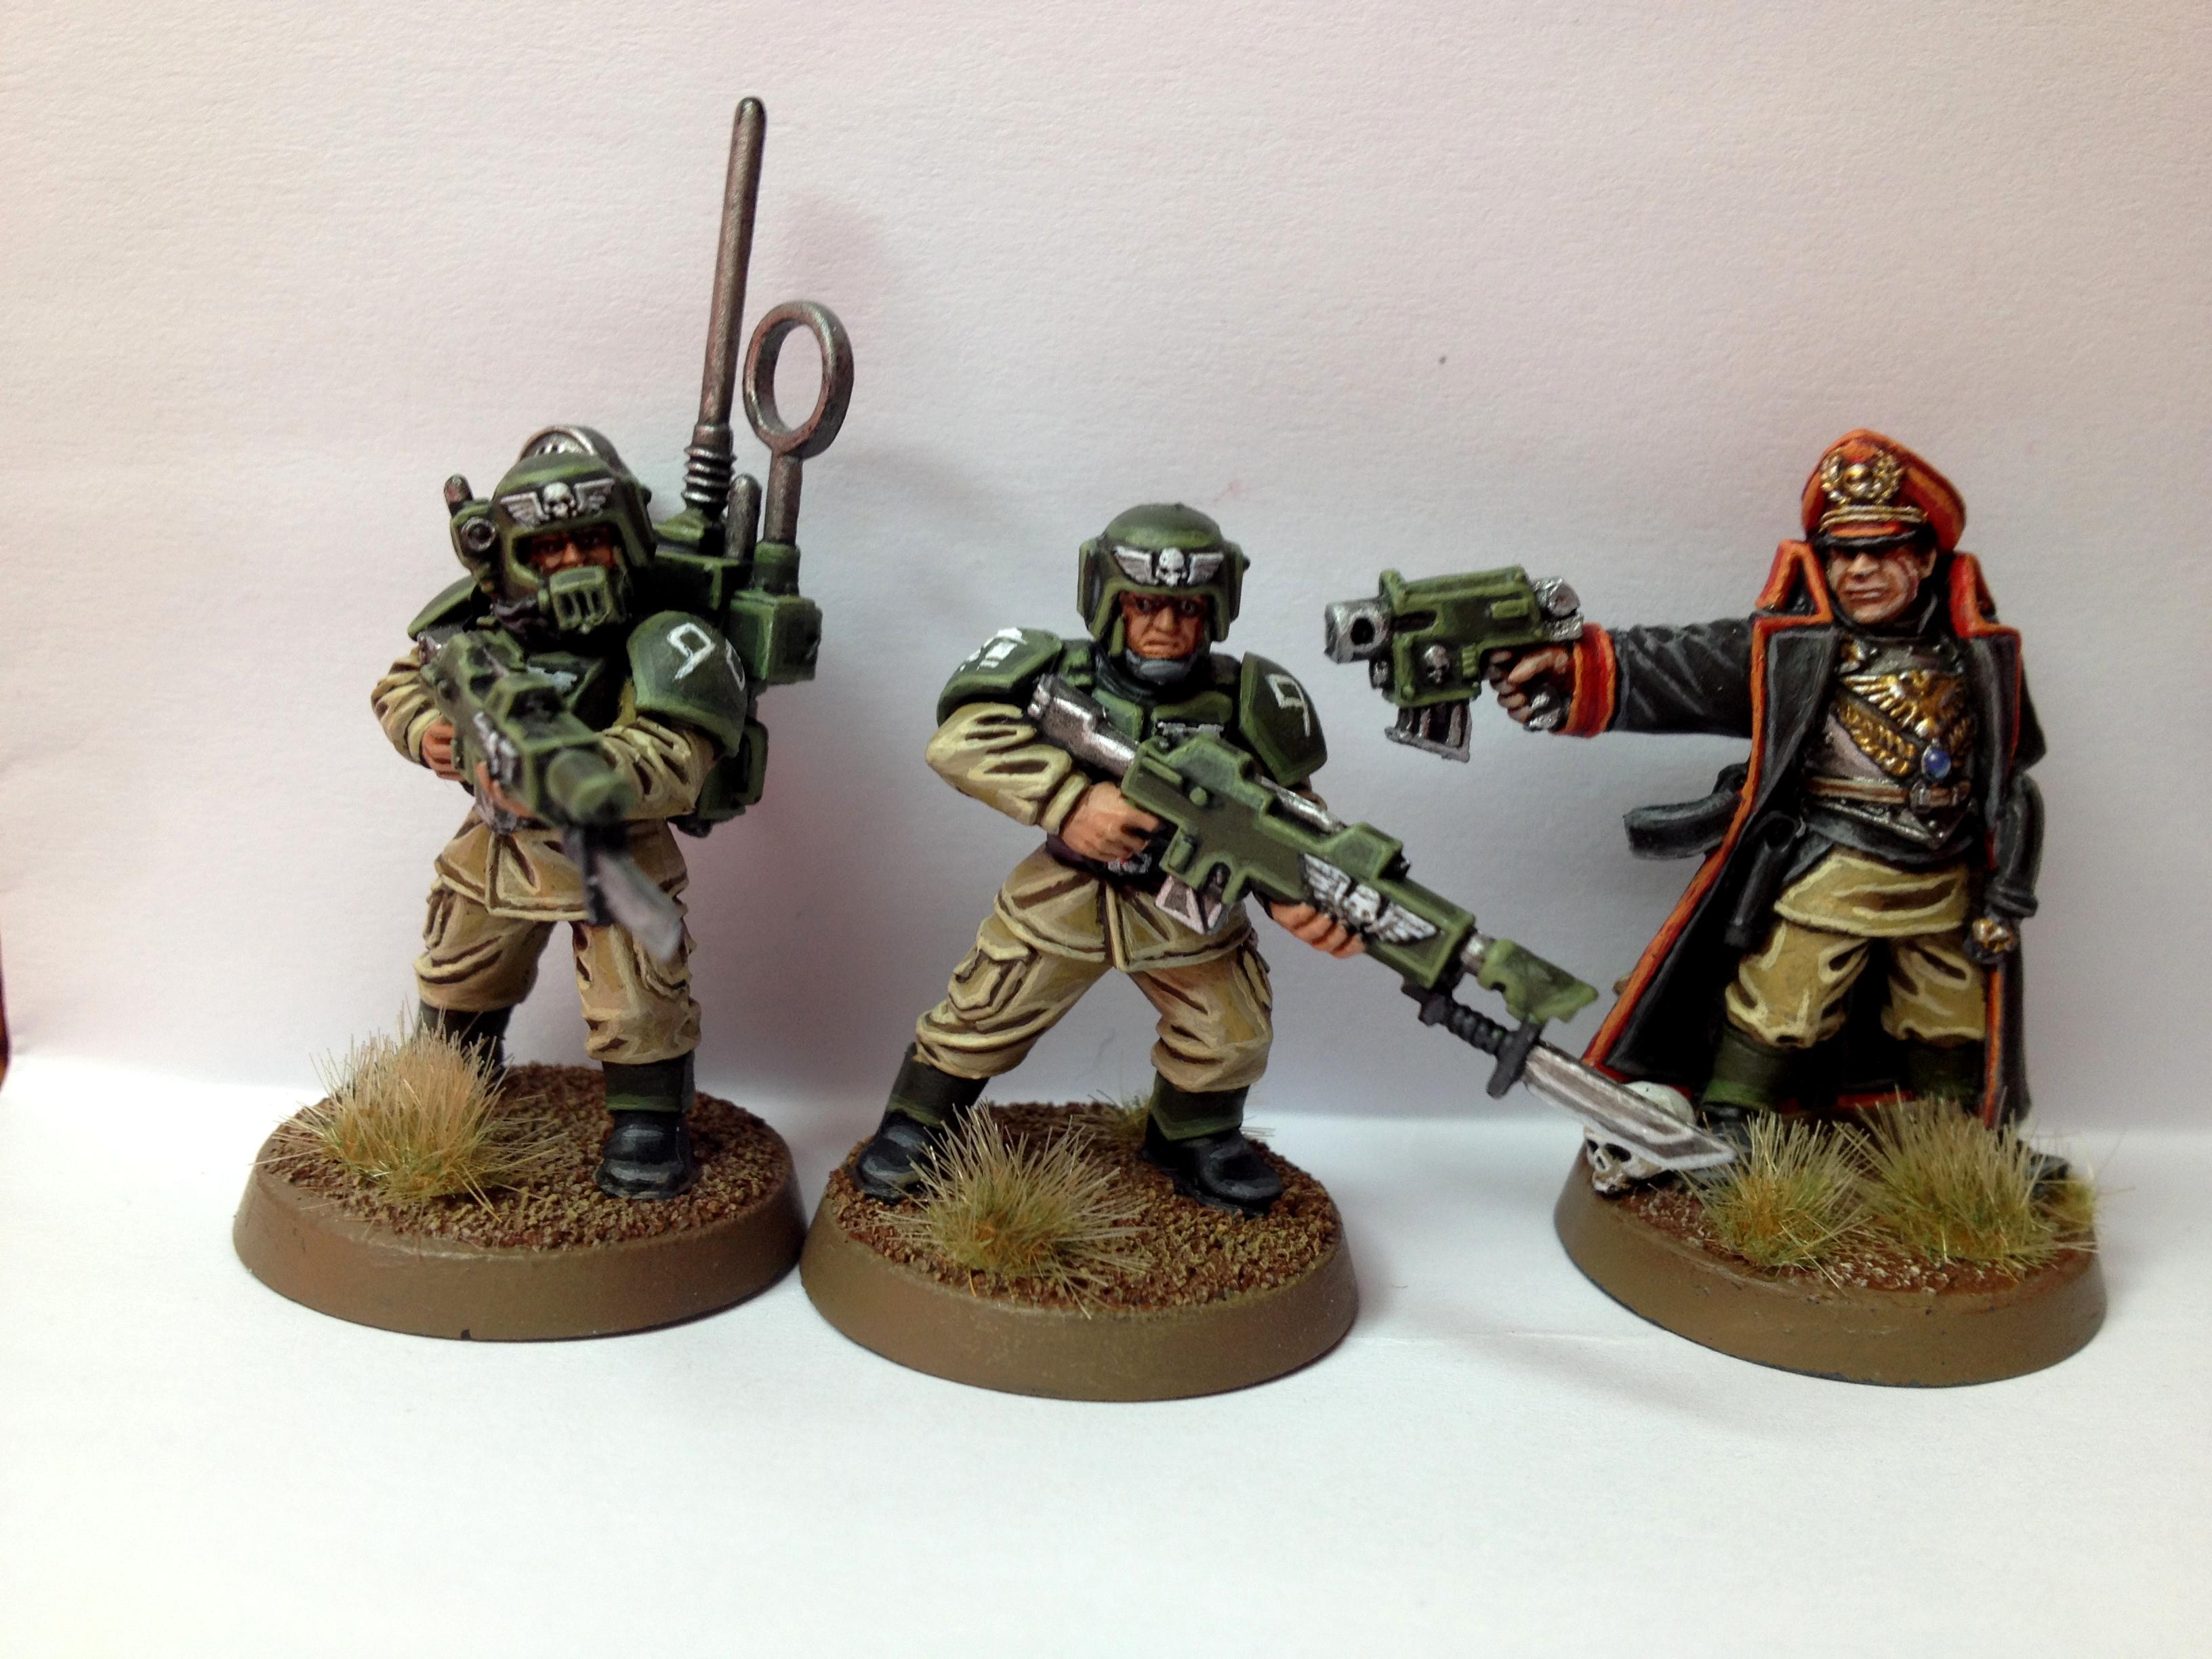 Cadians, Commissar, Guard, Warhammer 40,000